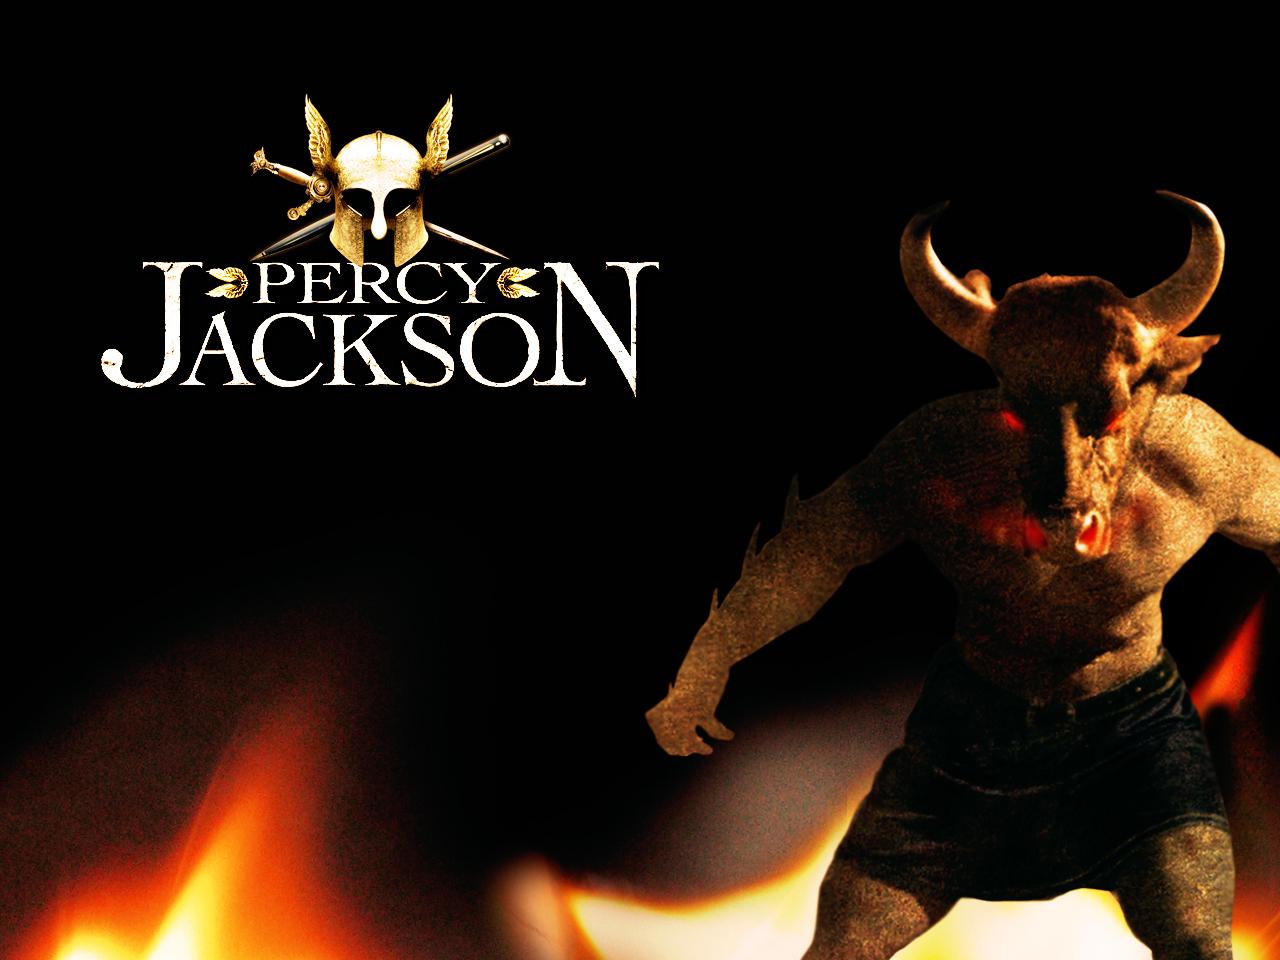 Percy Jackson 壁纸 UK